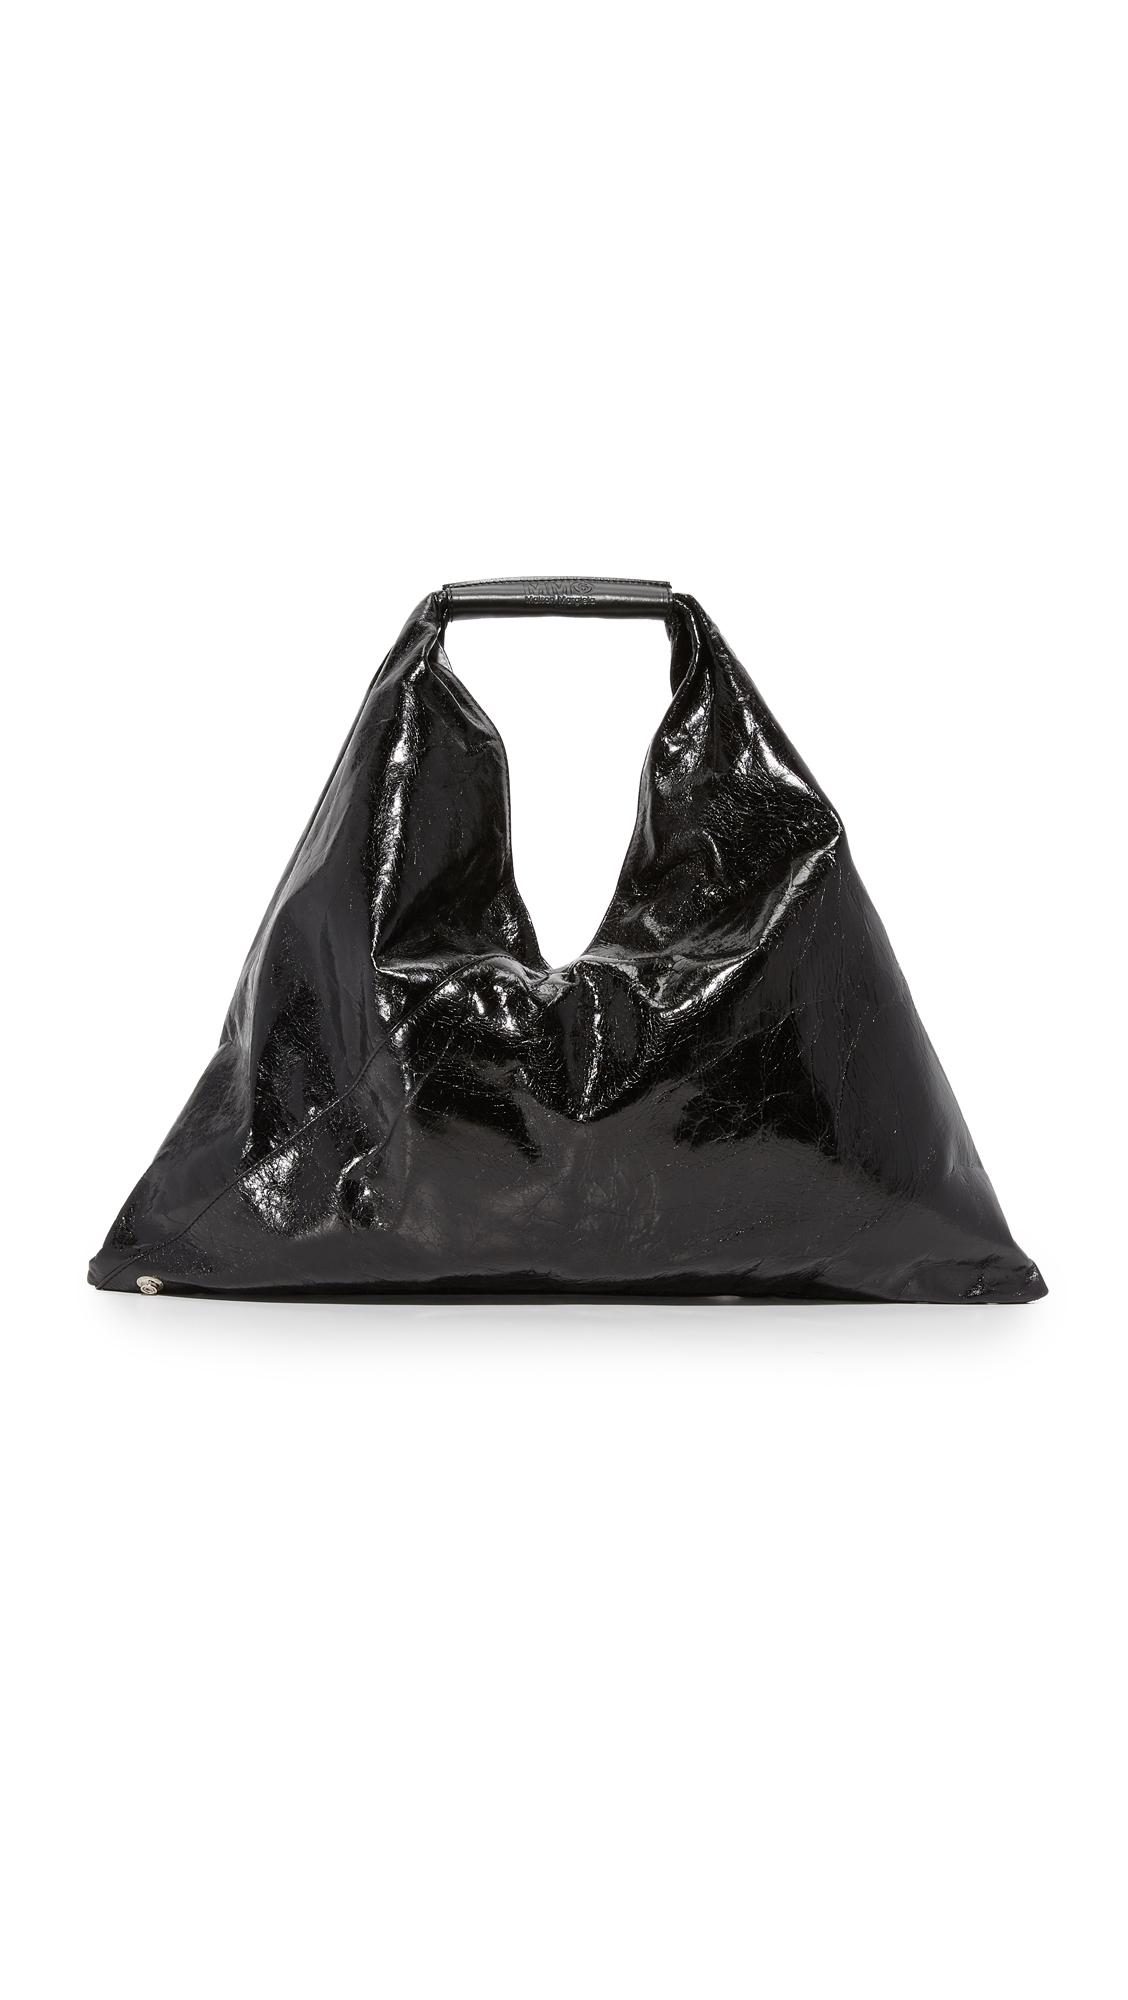 mm6 female mm6 satchel black